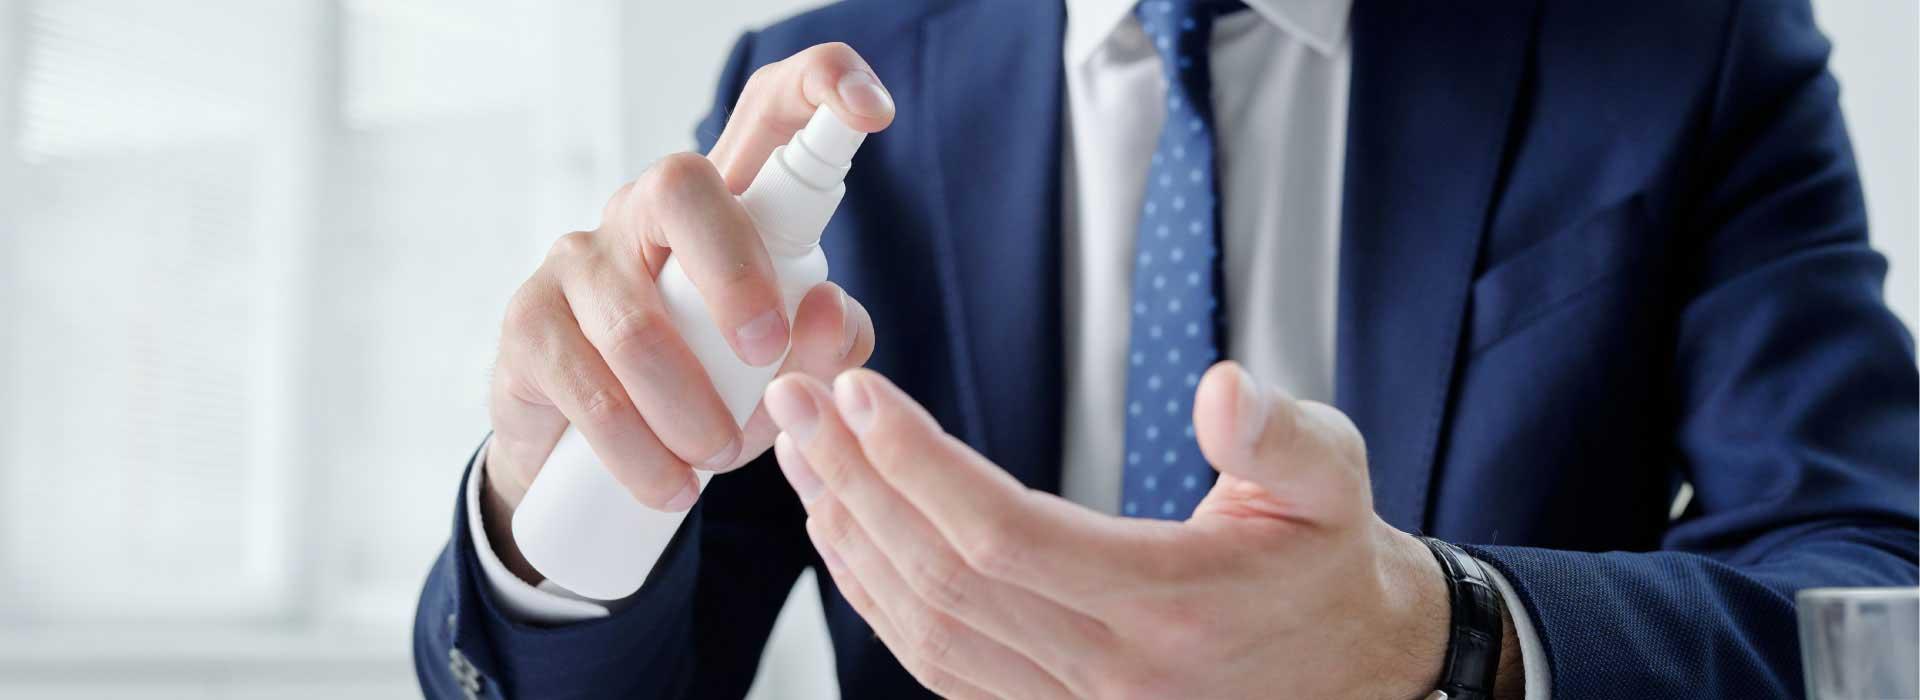 Sanitising hands in office